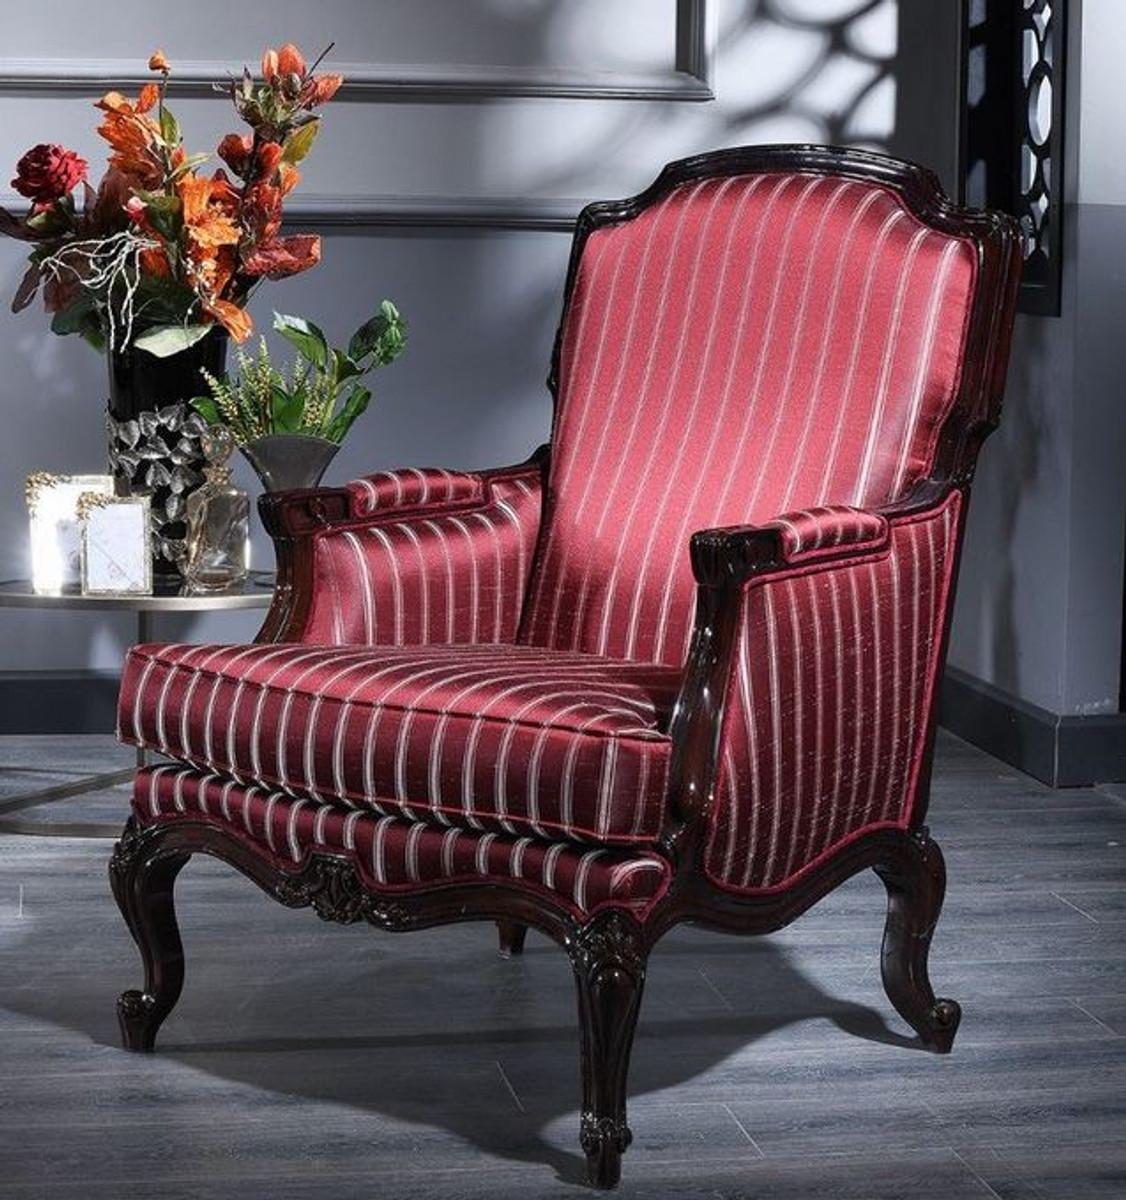 Casa Padrino Luxus Barock Sessel Bordeauxrot / Silber / Schwarz 77 x 85 x H. 110 cm - Gestreifter Wohnzimmer Sessel im Barockstil 1